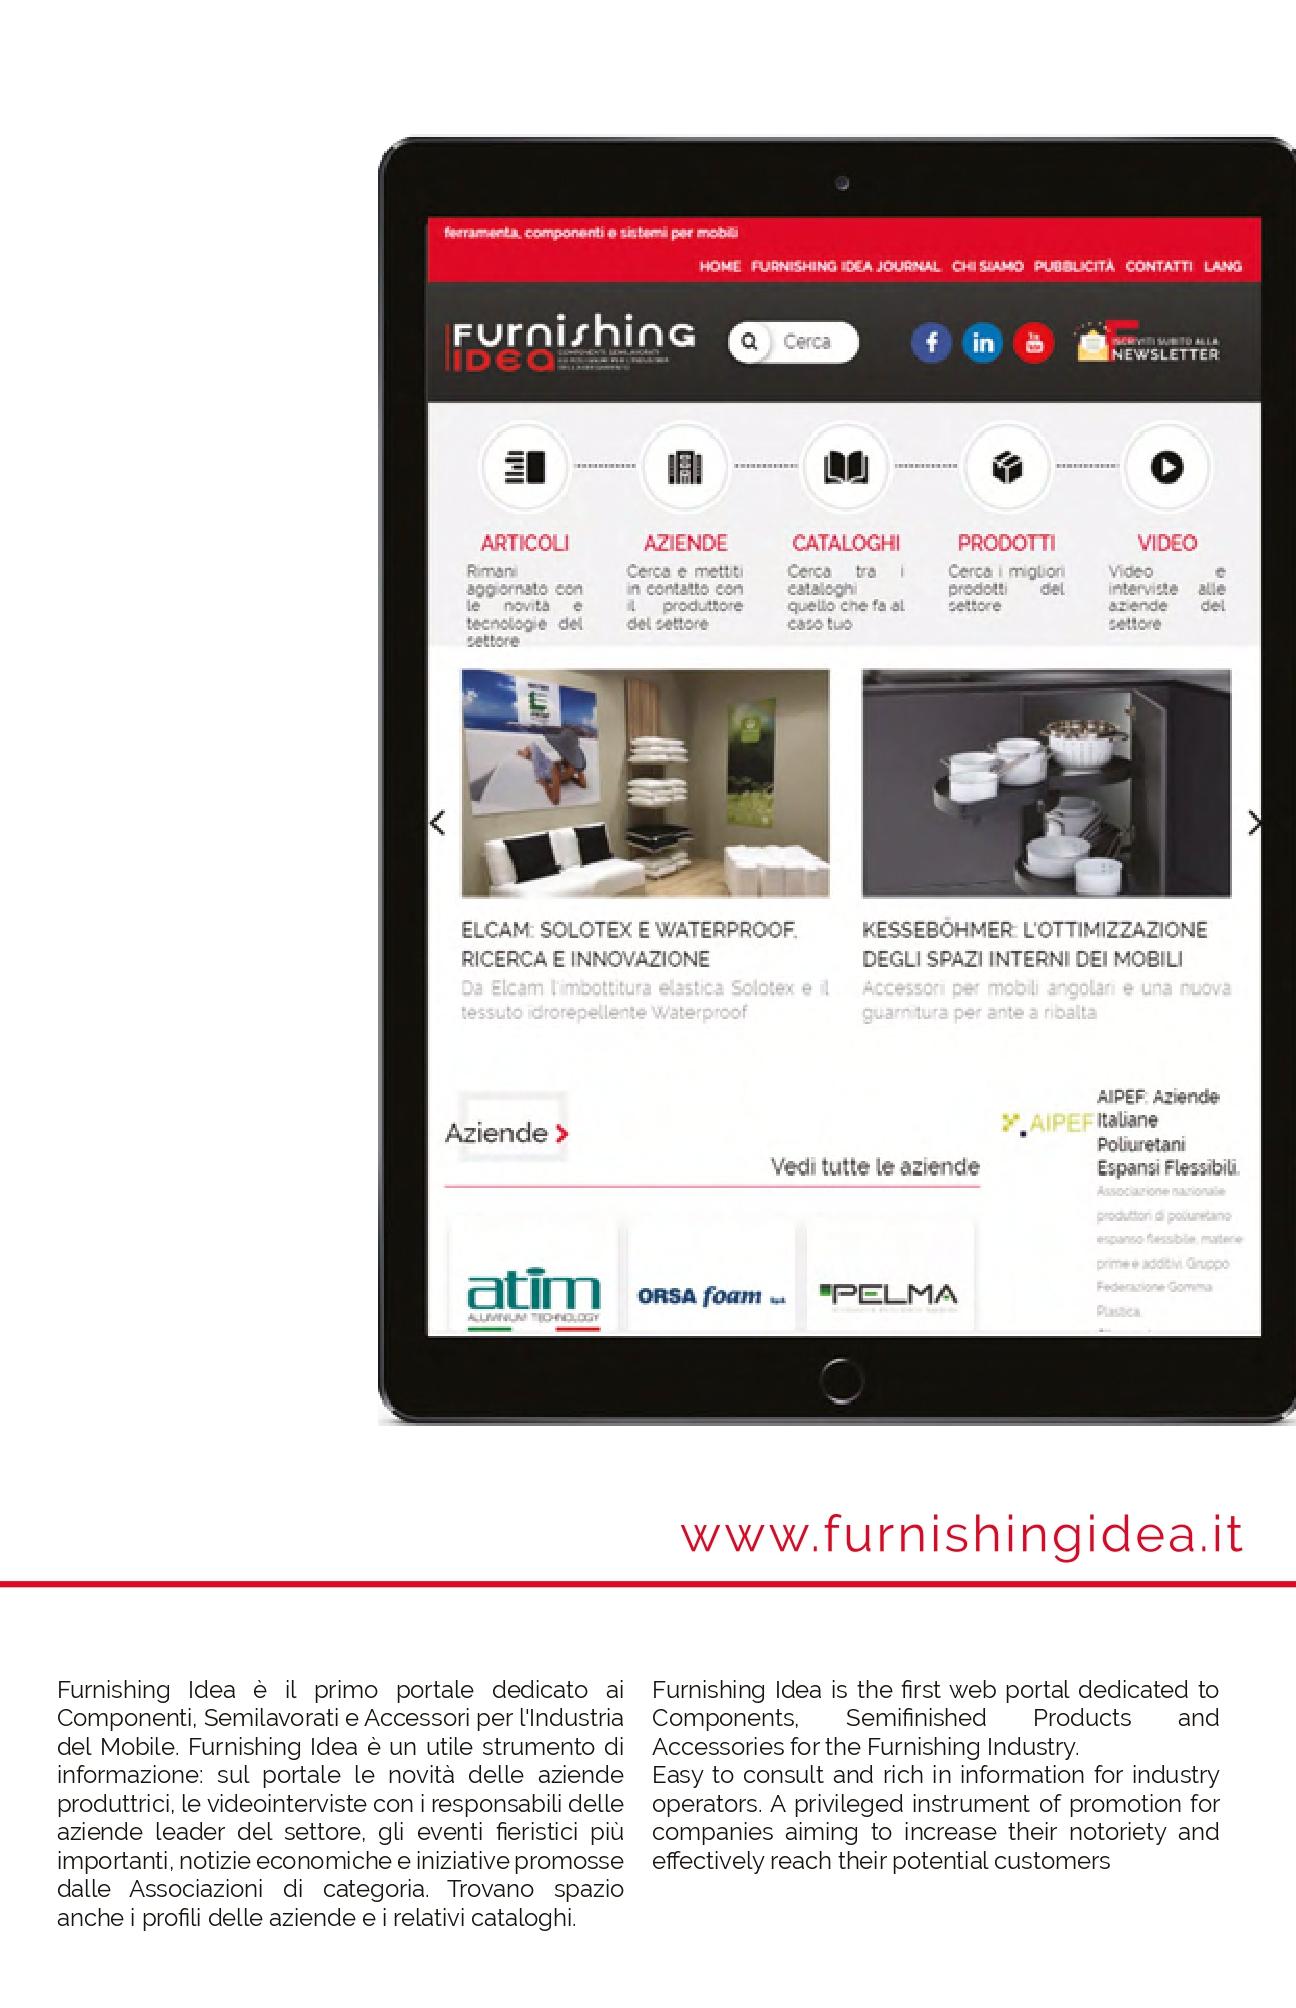 furnishingidea-6-2020_journal_22_051.jpg